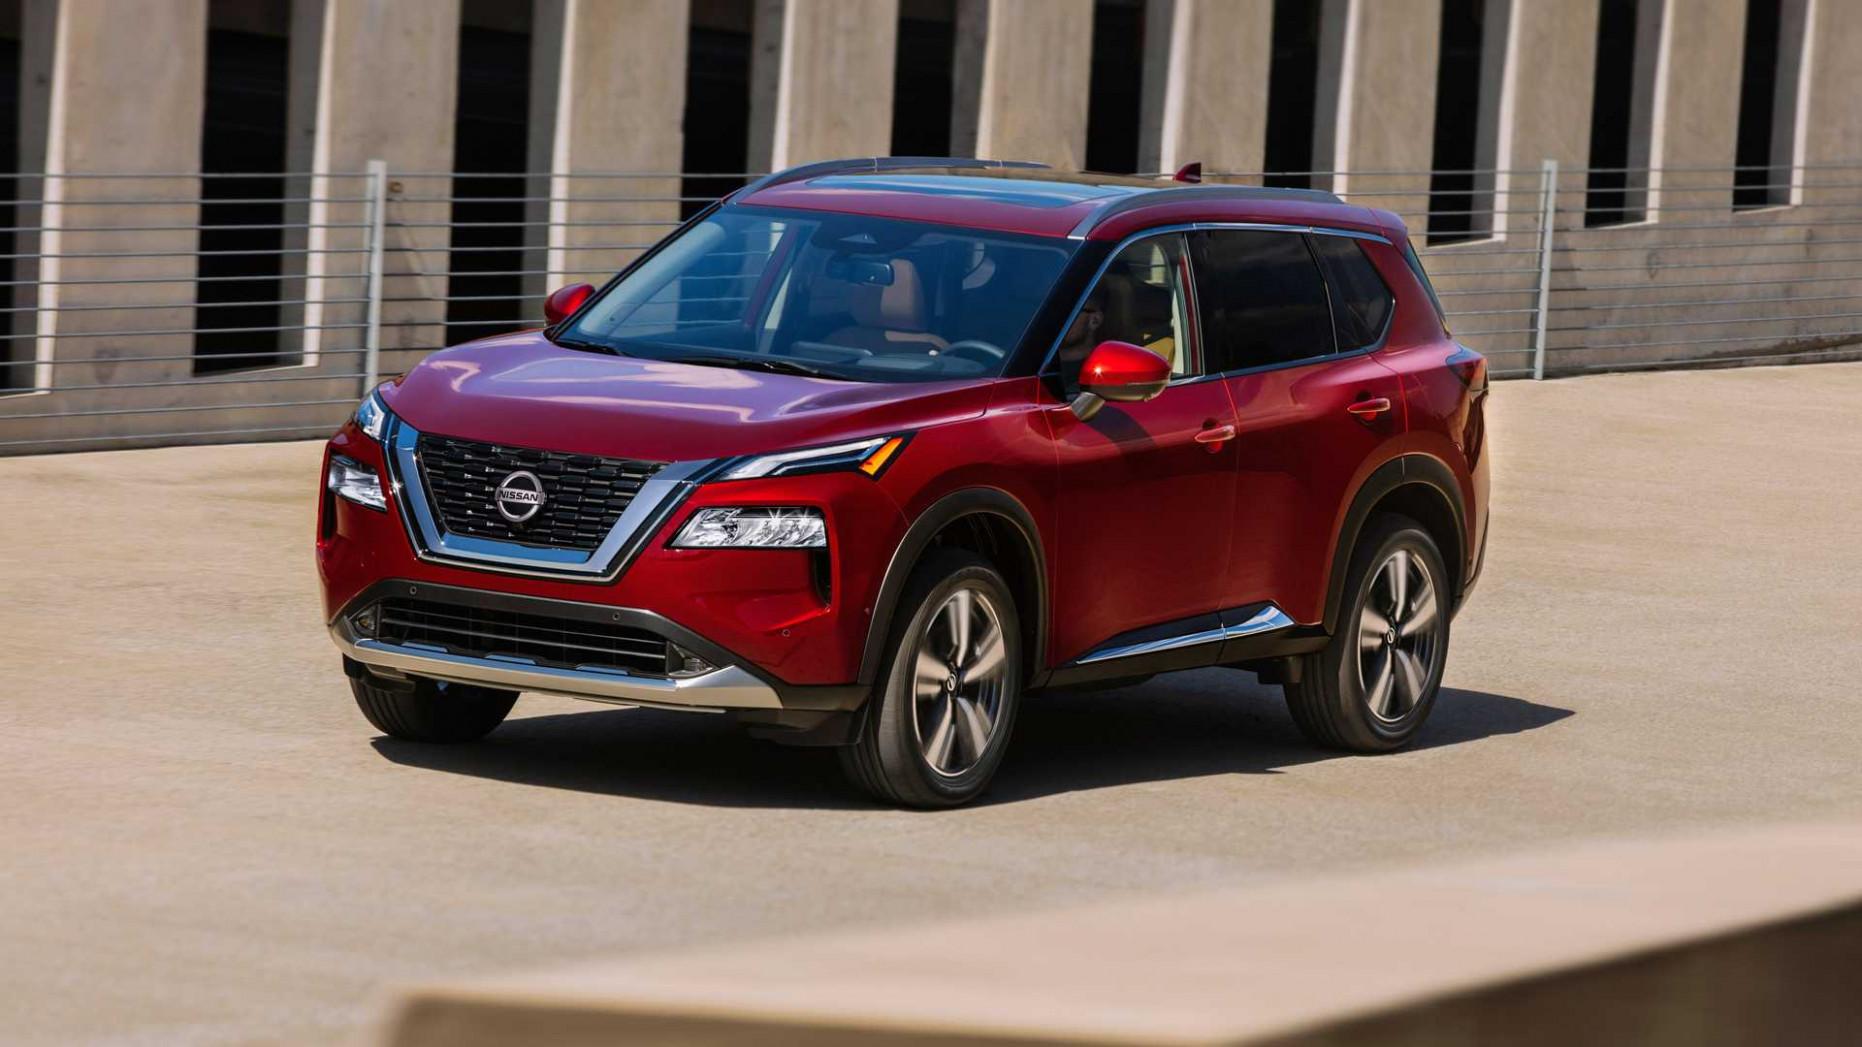 Spesification 2022 Nissan Rogue Hybrid